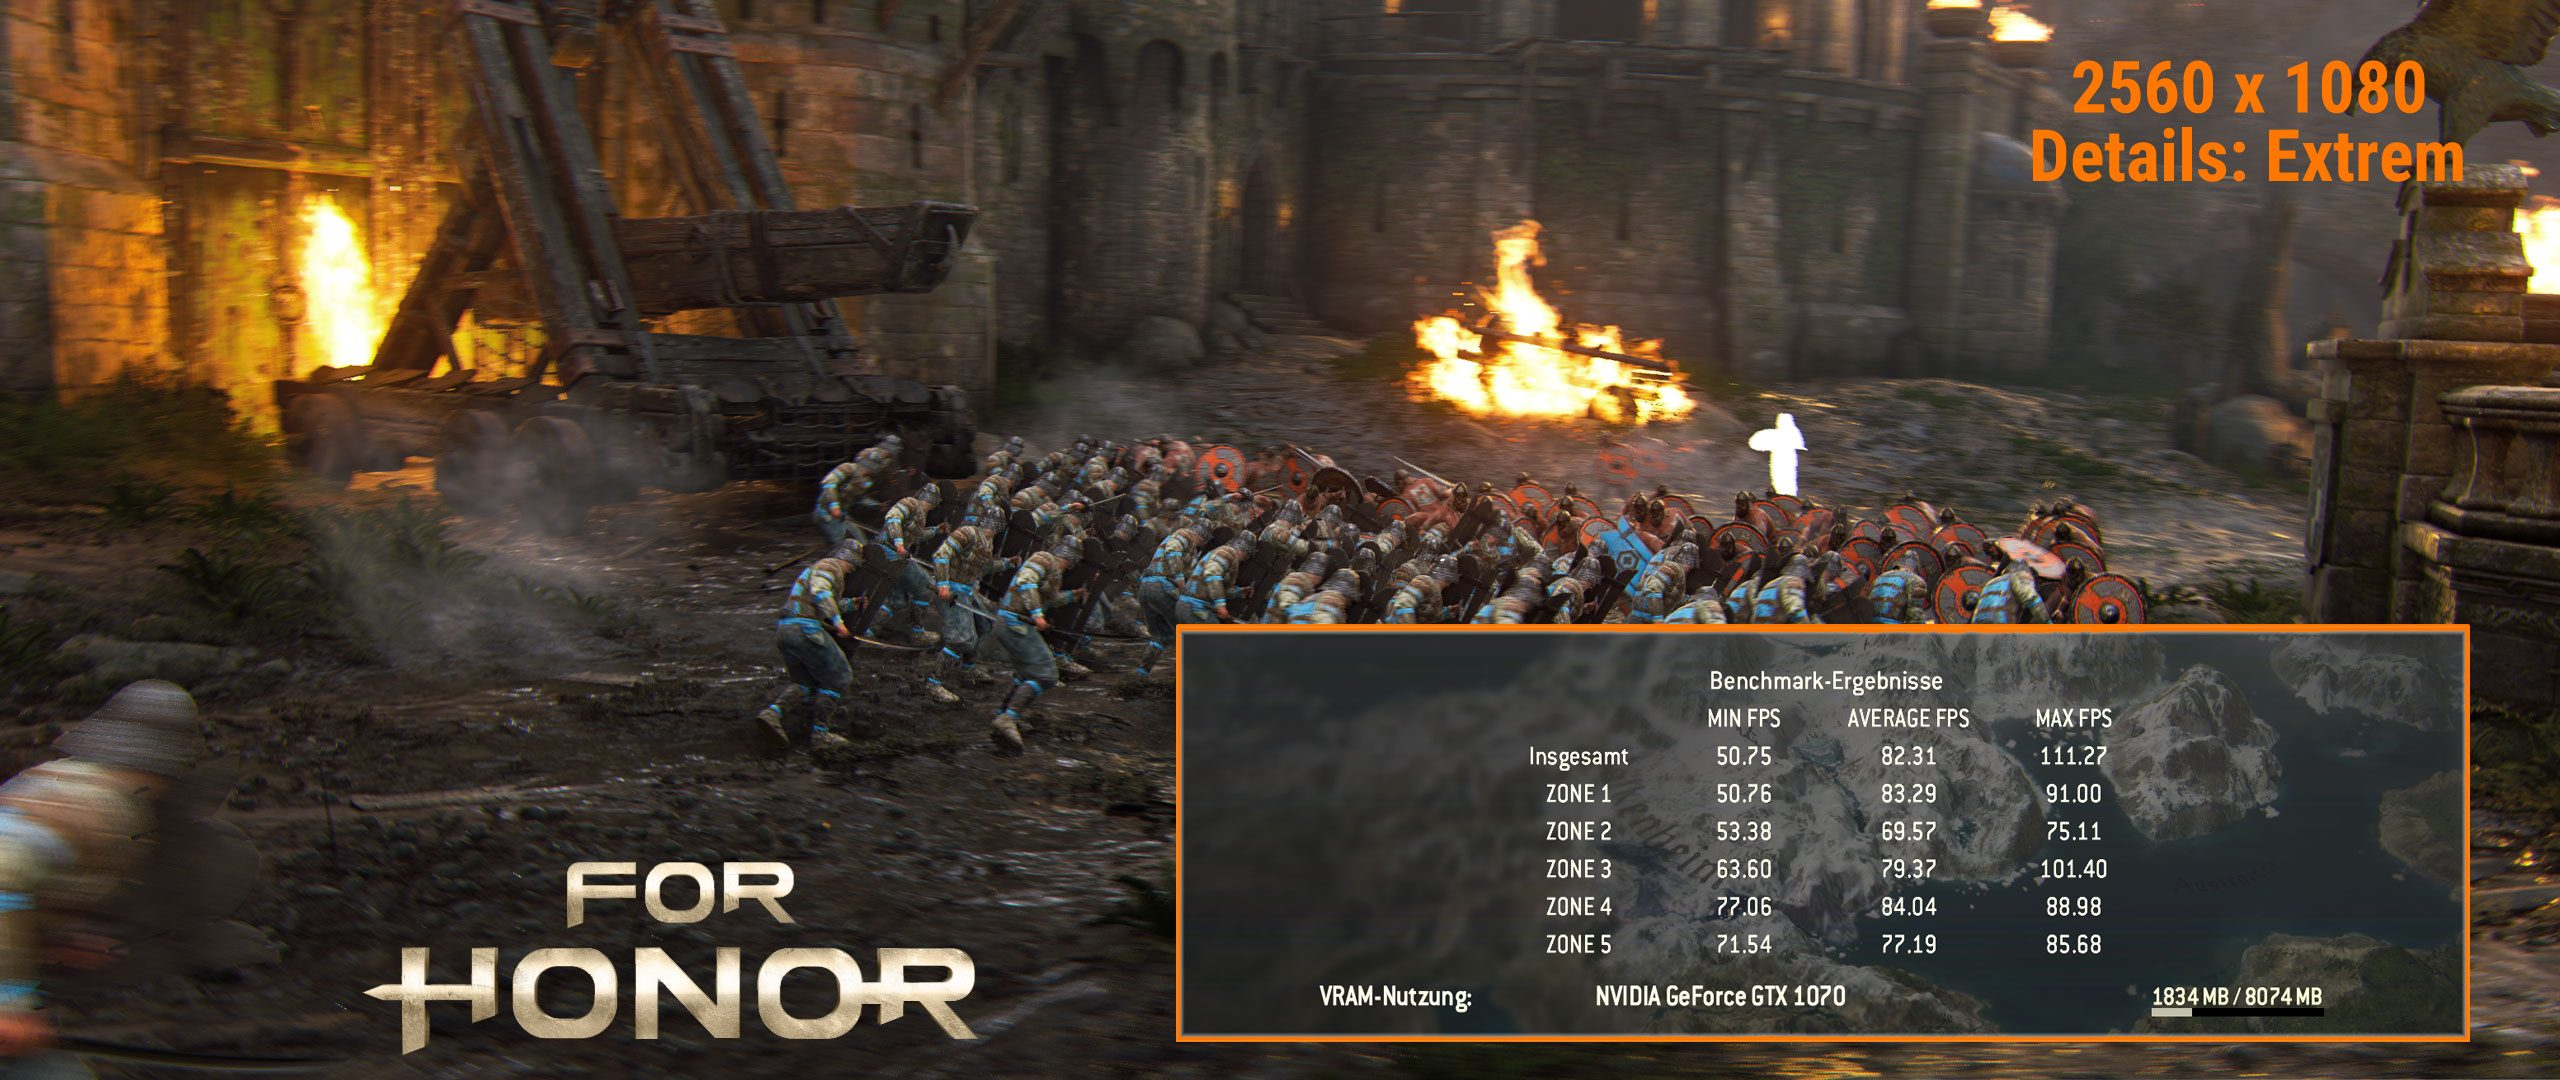 Acer-Predator-17-G9-793-718-Games-Monitor-7